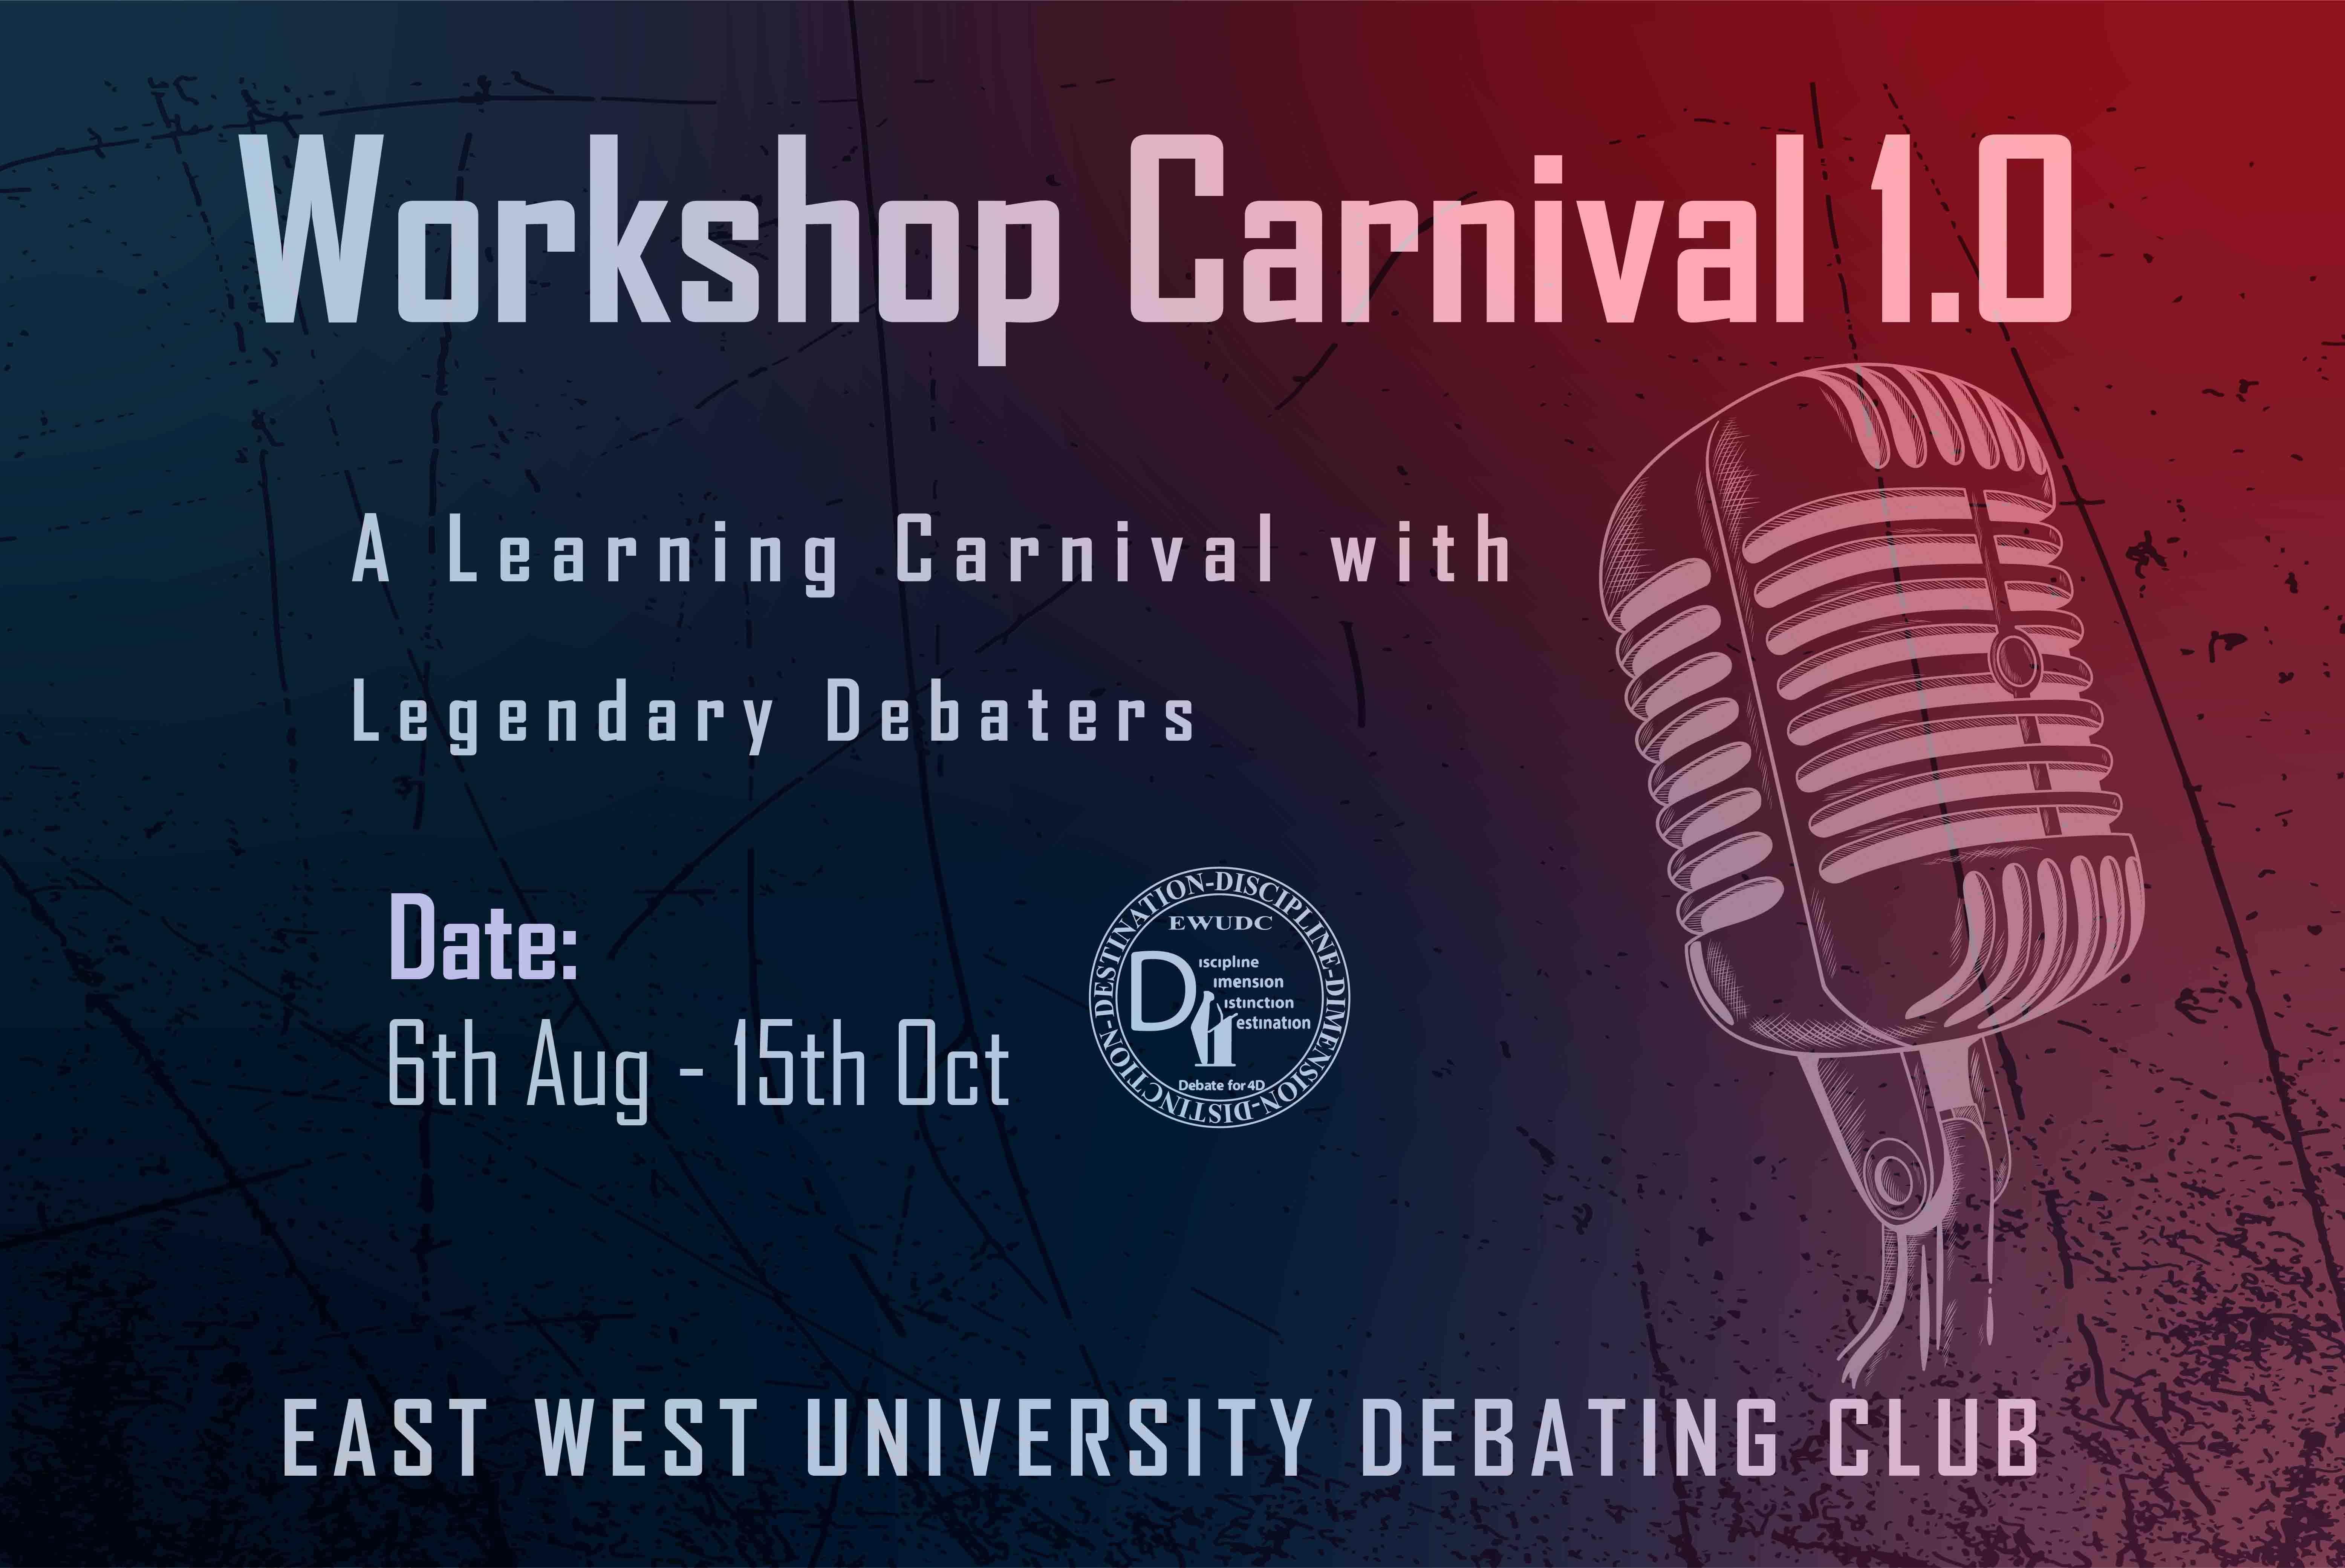 """Workshop Carnival 1.0,"" arranged by East West Uni..."